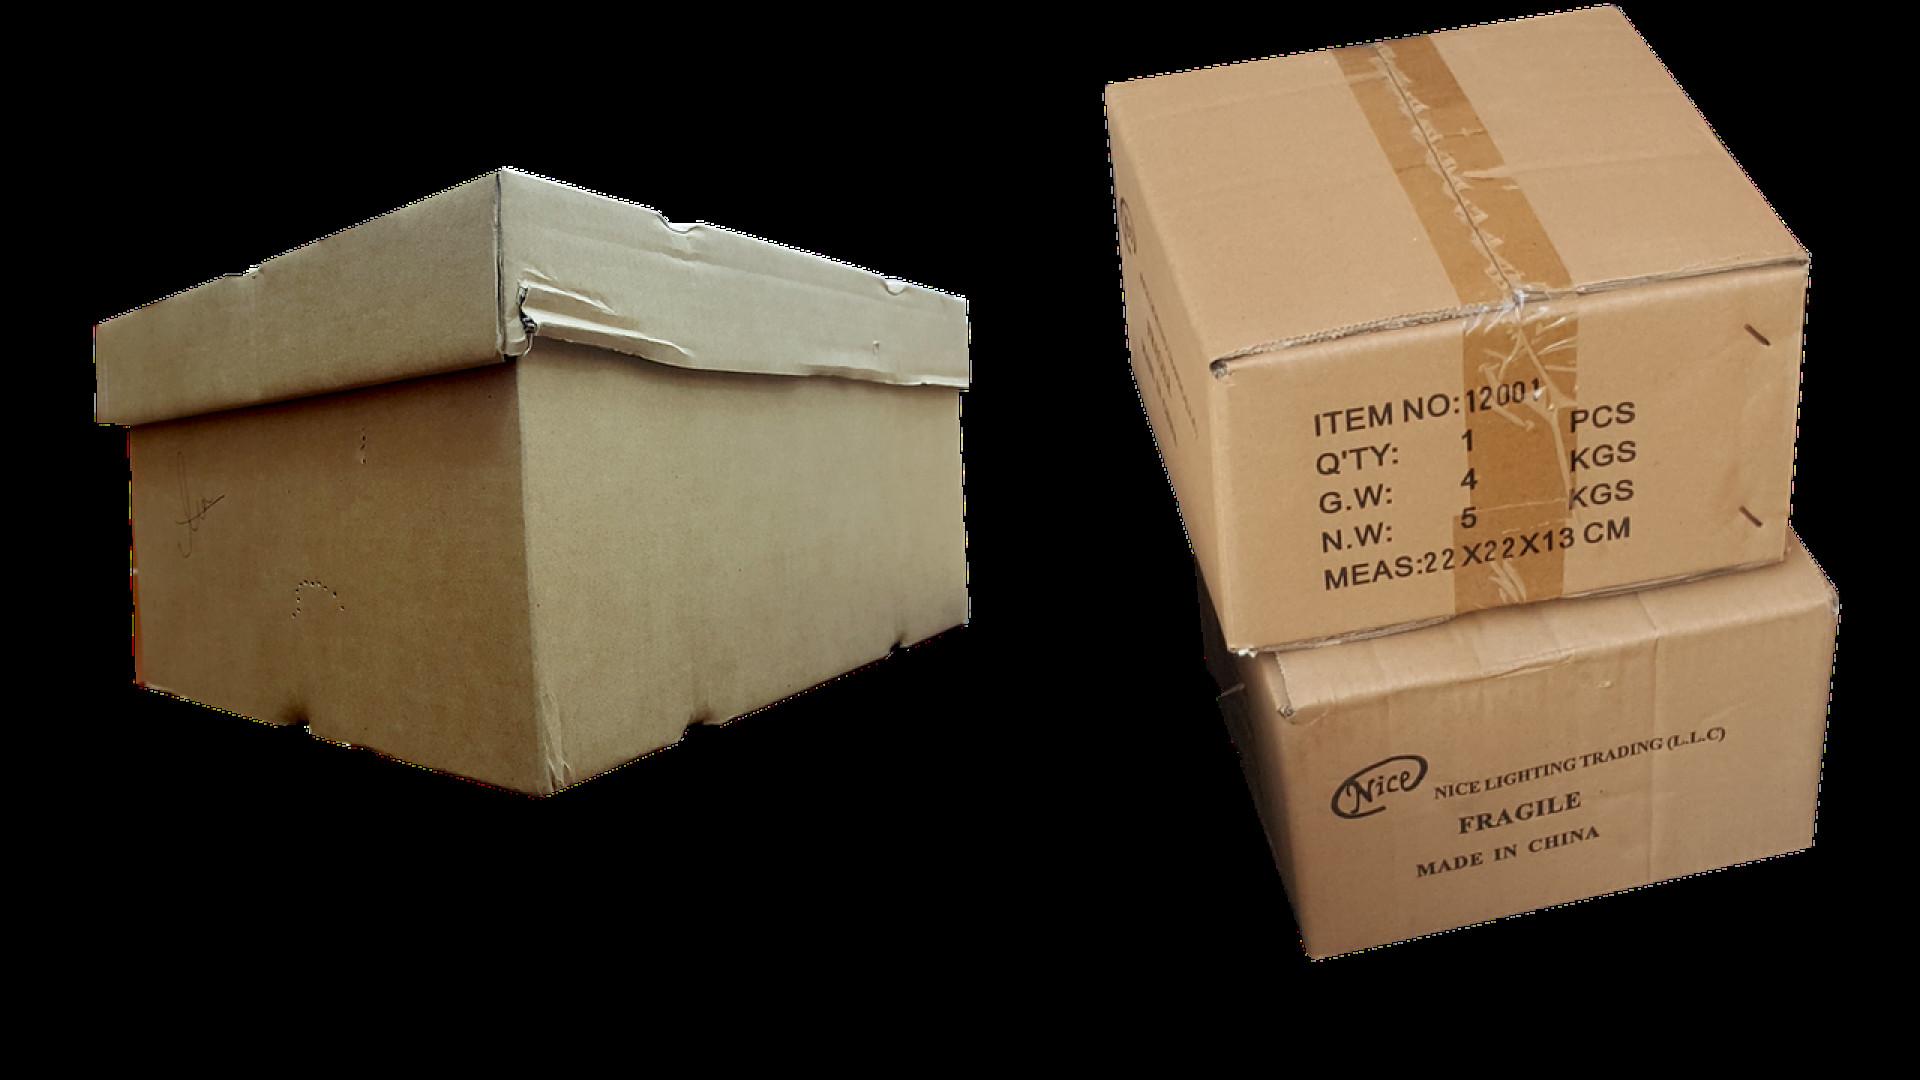 bab3cd67f5da841027c4632494b780d4 - Pourquoi choisir un garde-meuble ?